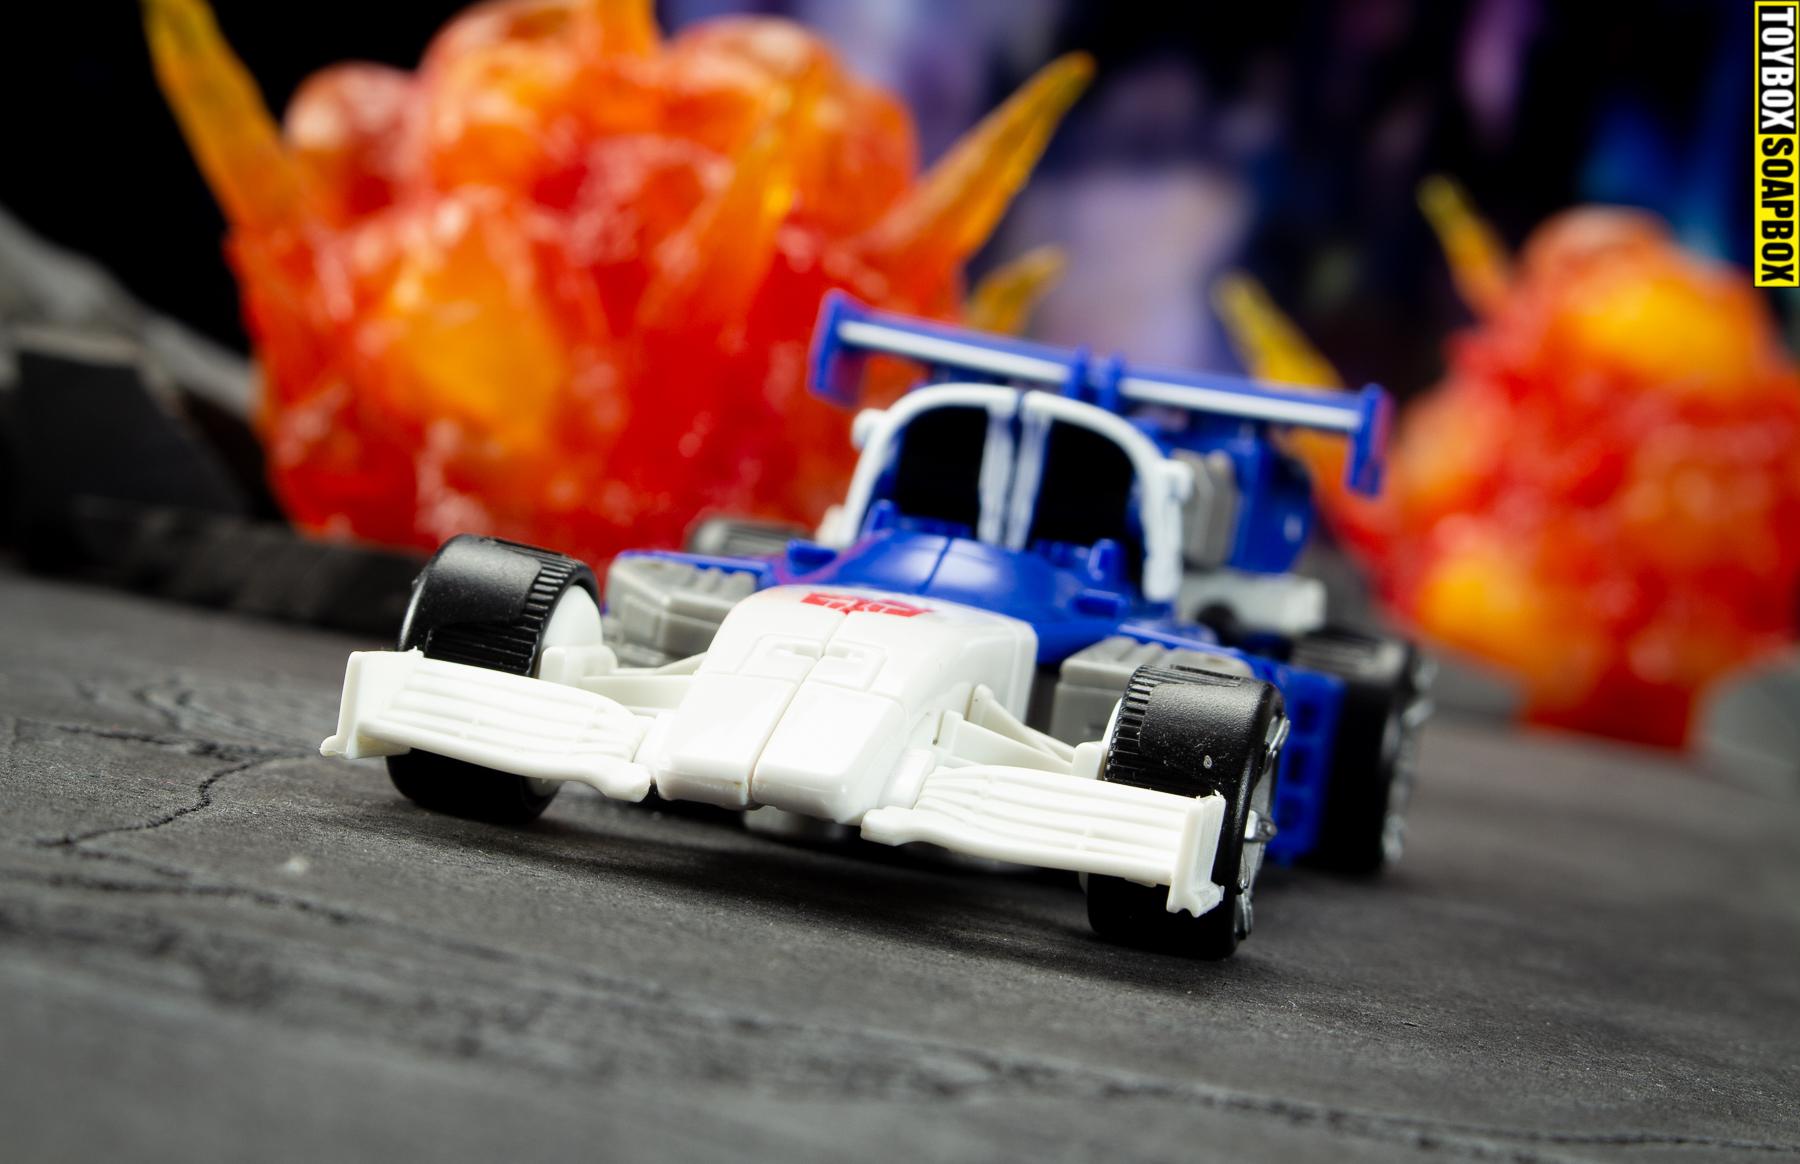 Mirage-f1-car-alt-mode